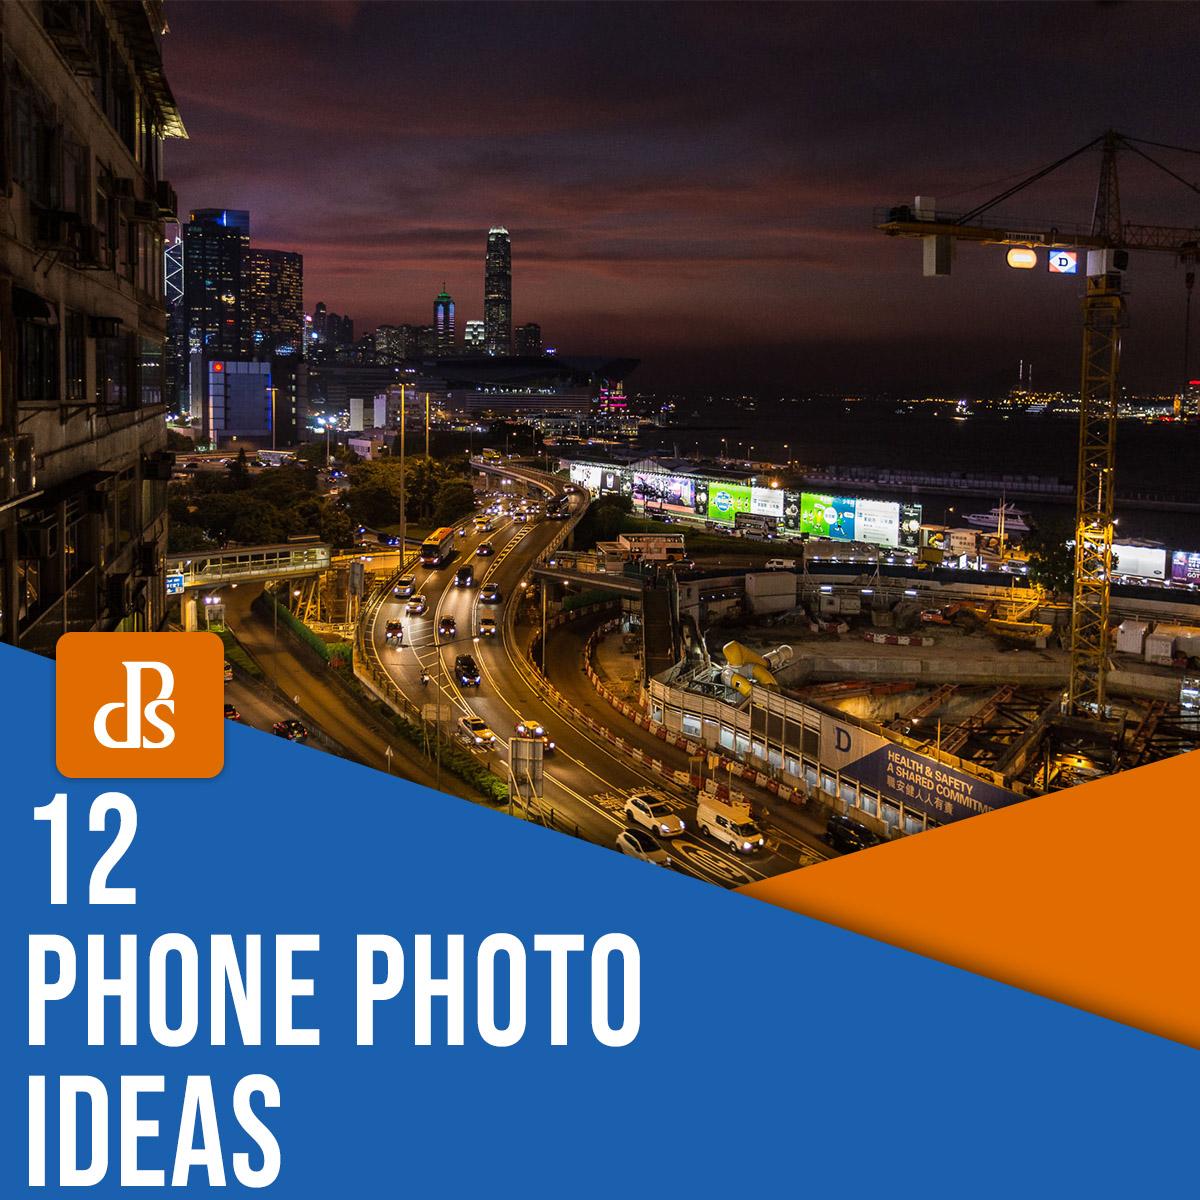 phone photography ideas